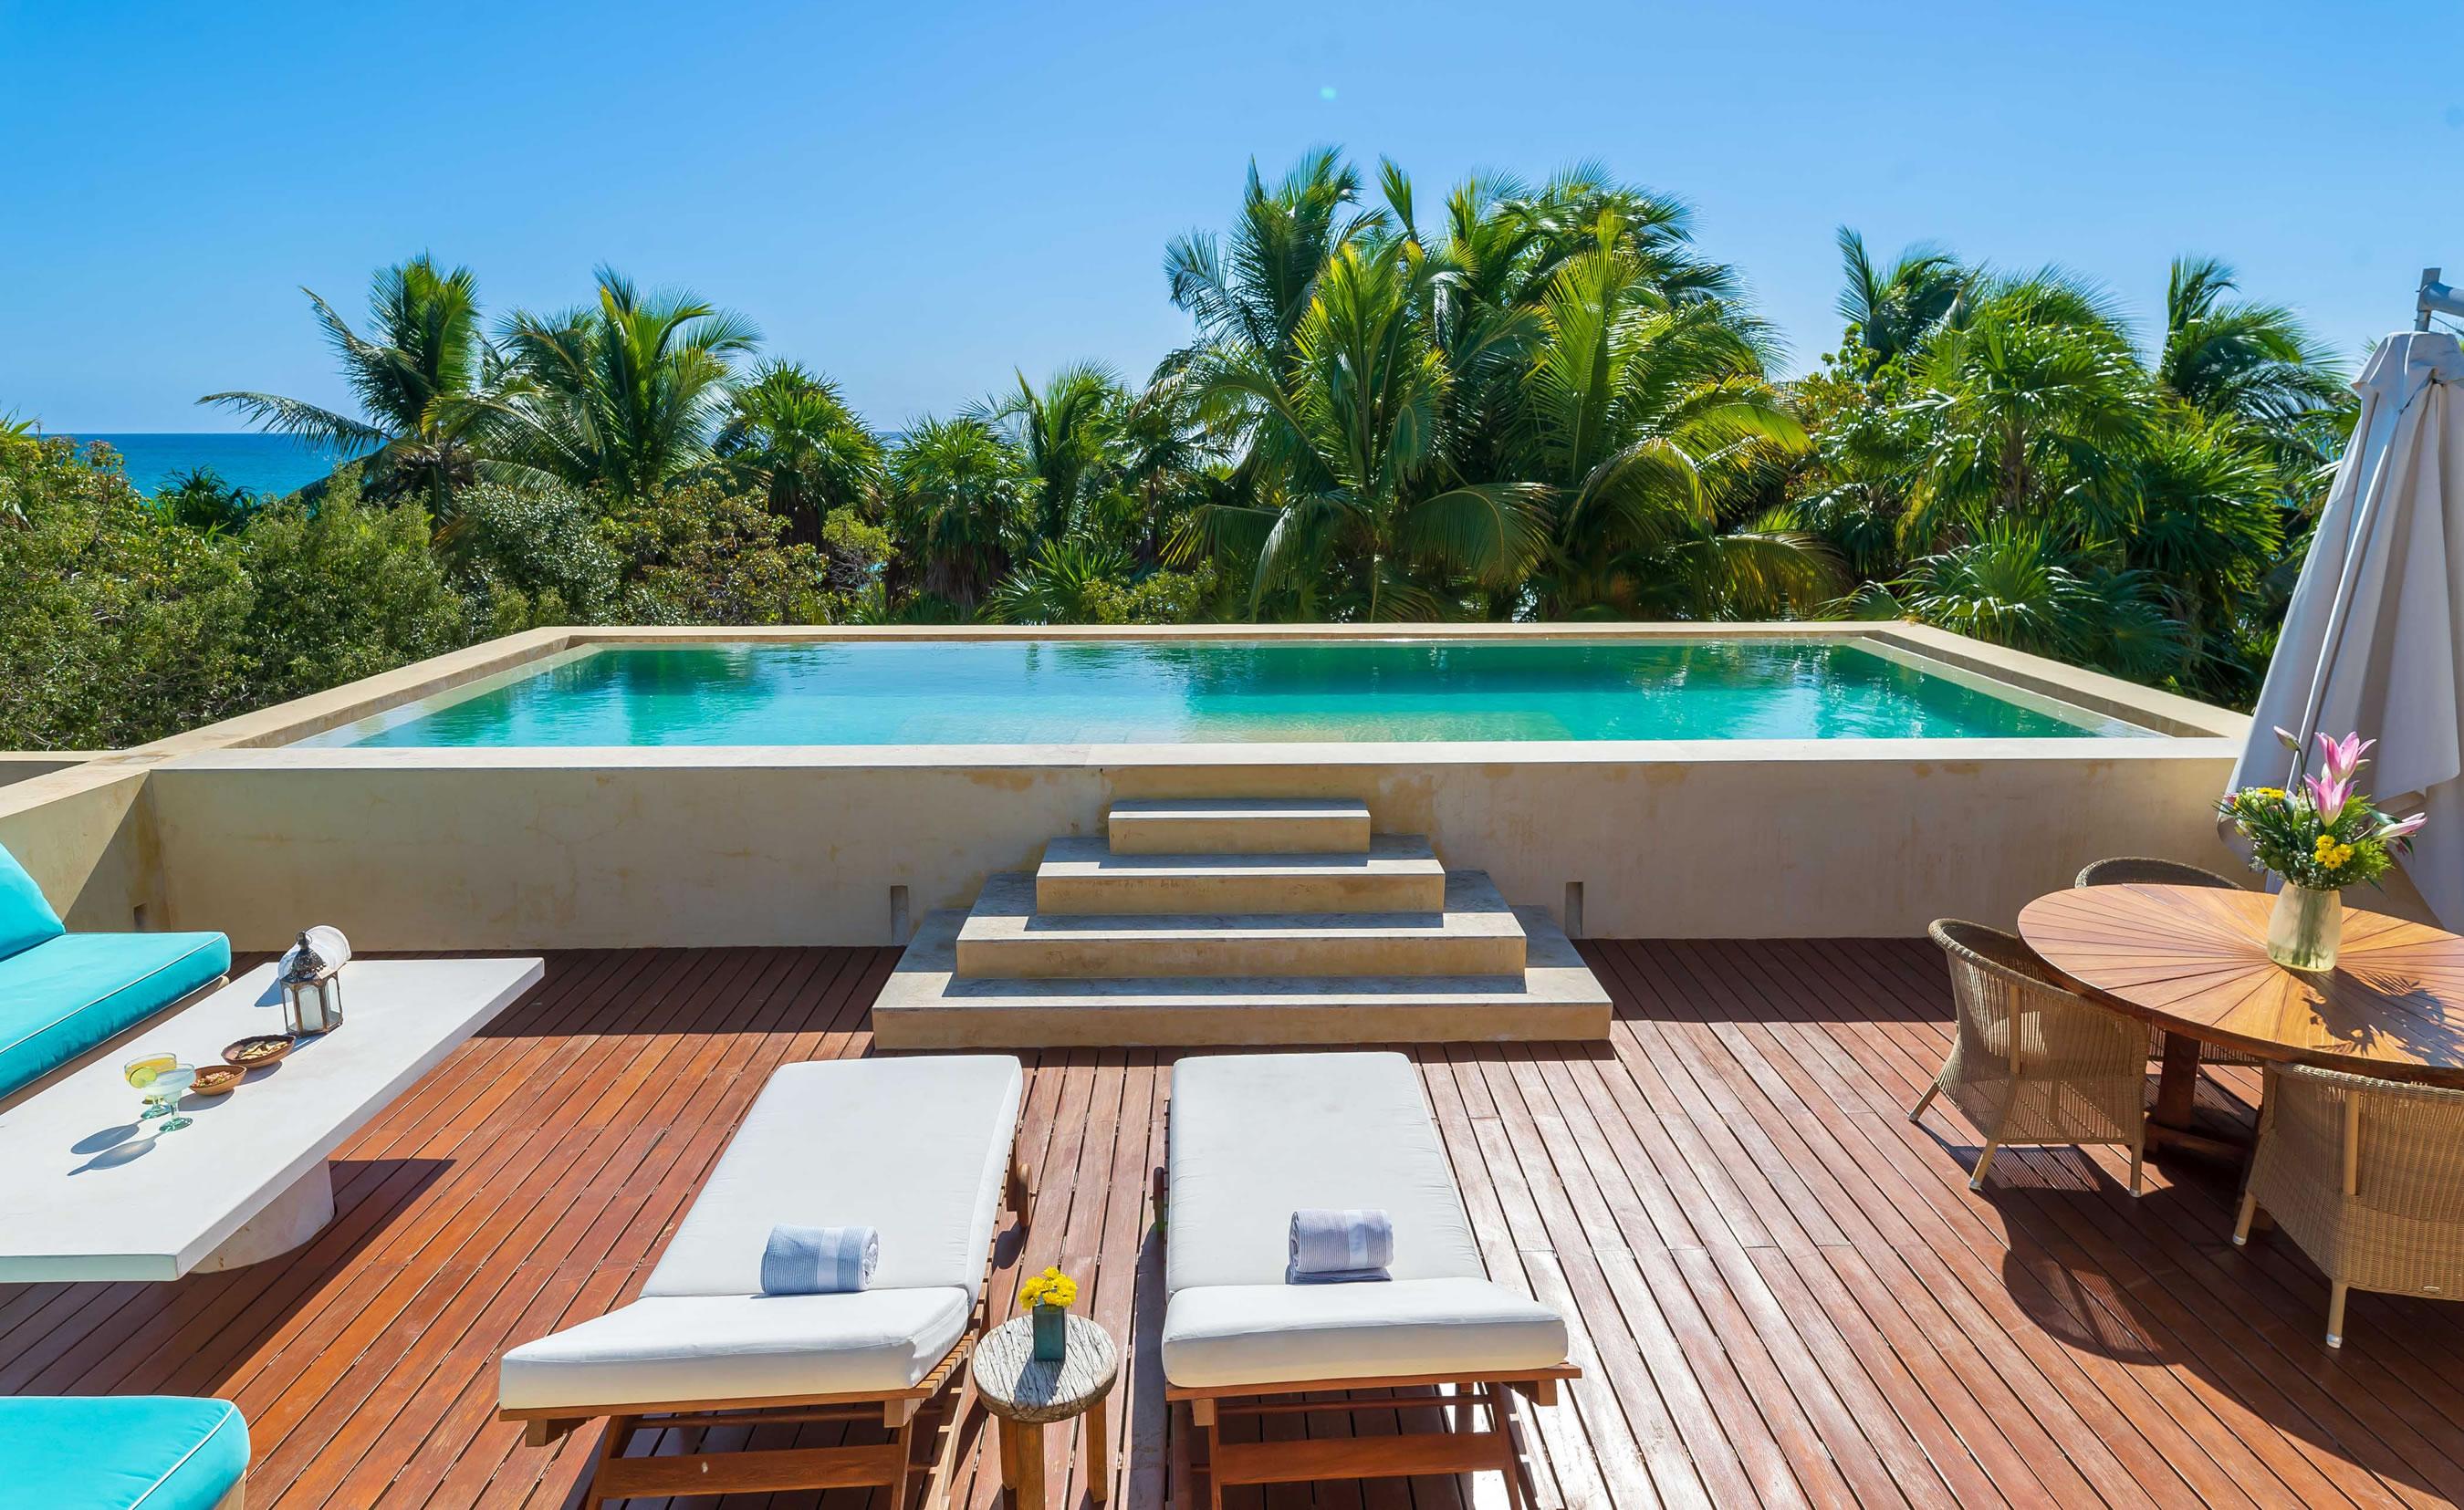 Hacienda Chekul - Rooftop Pool View